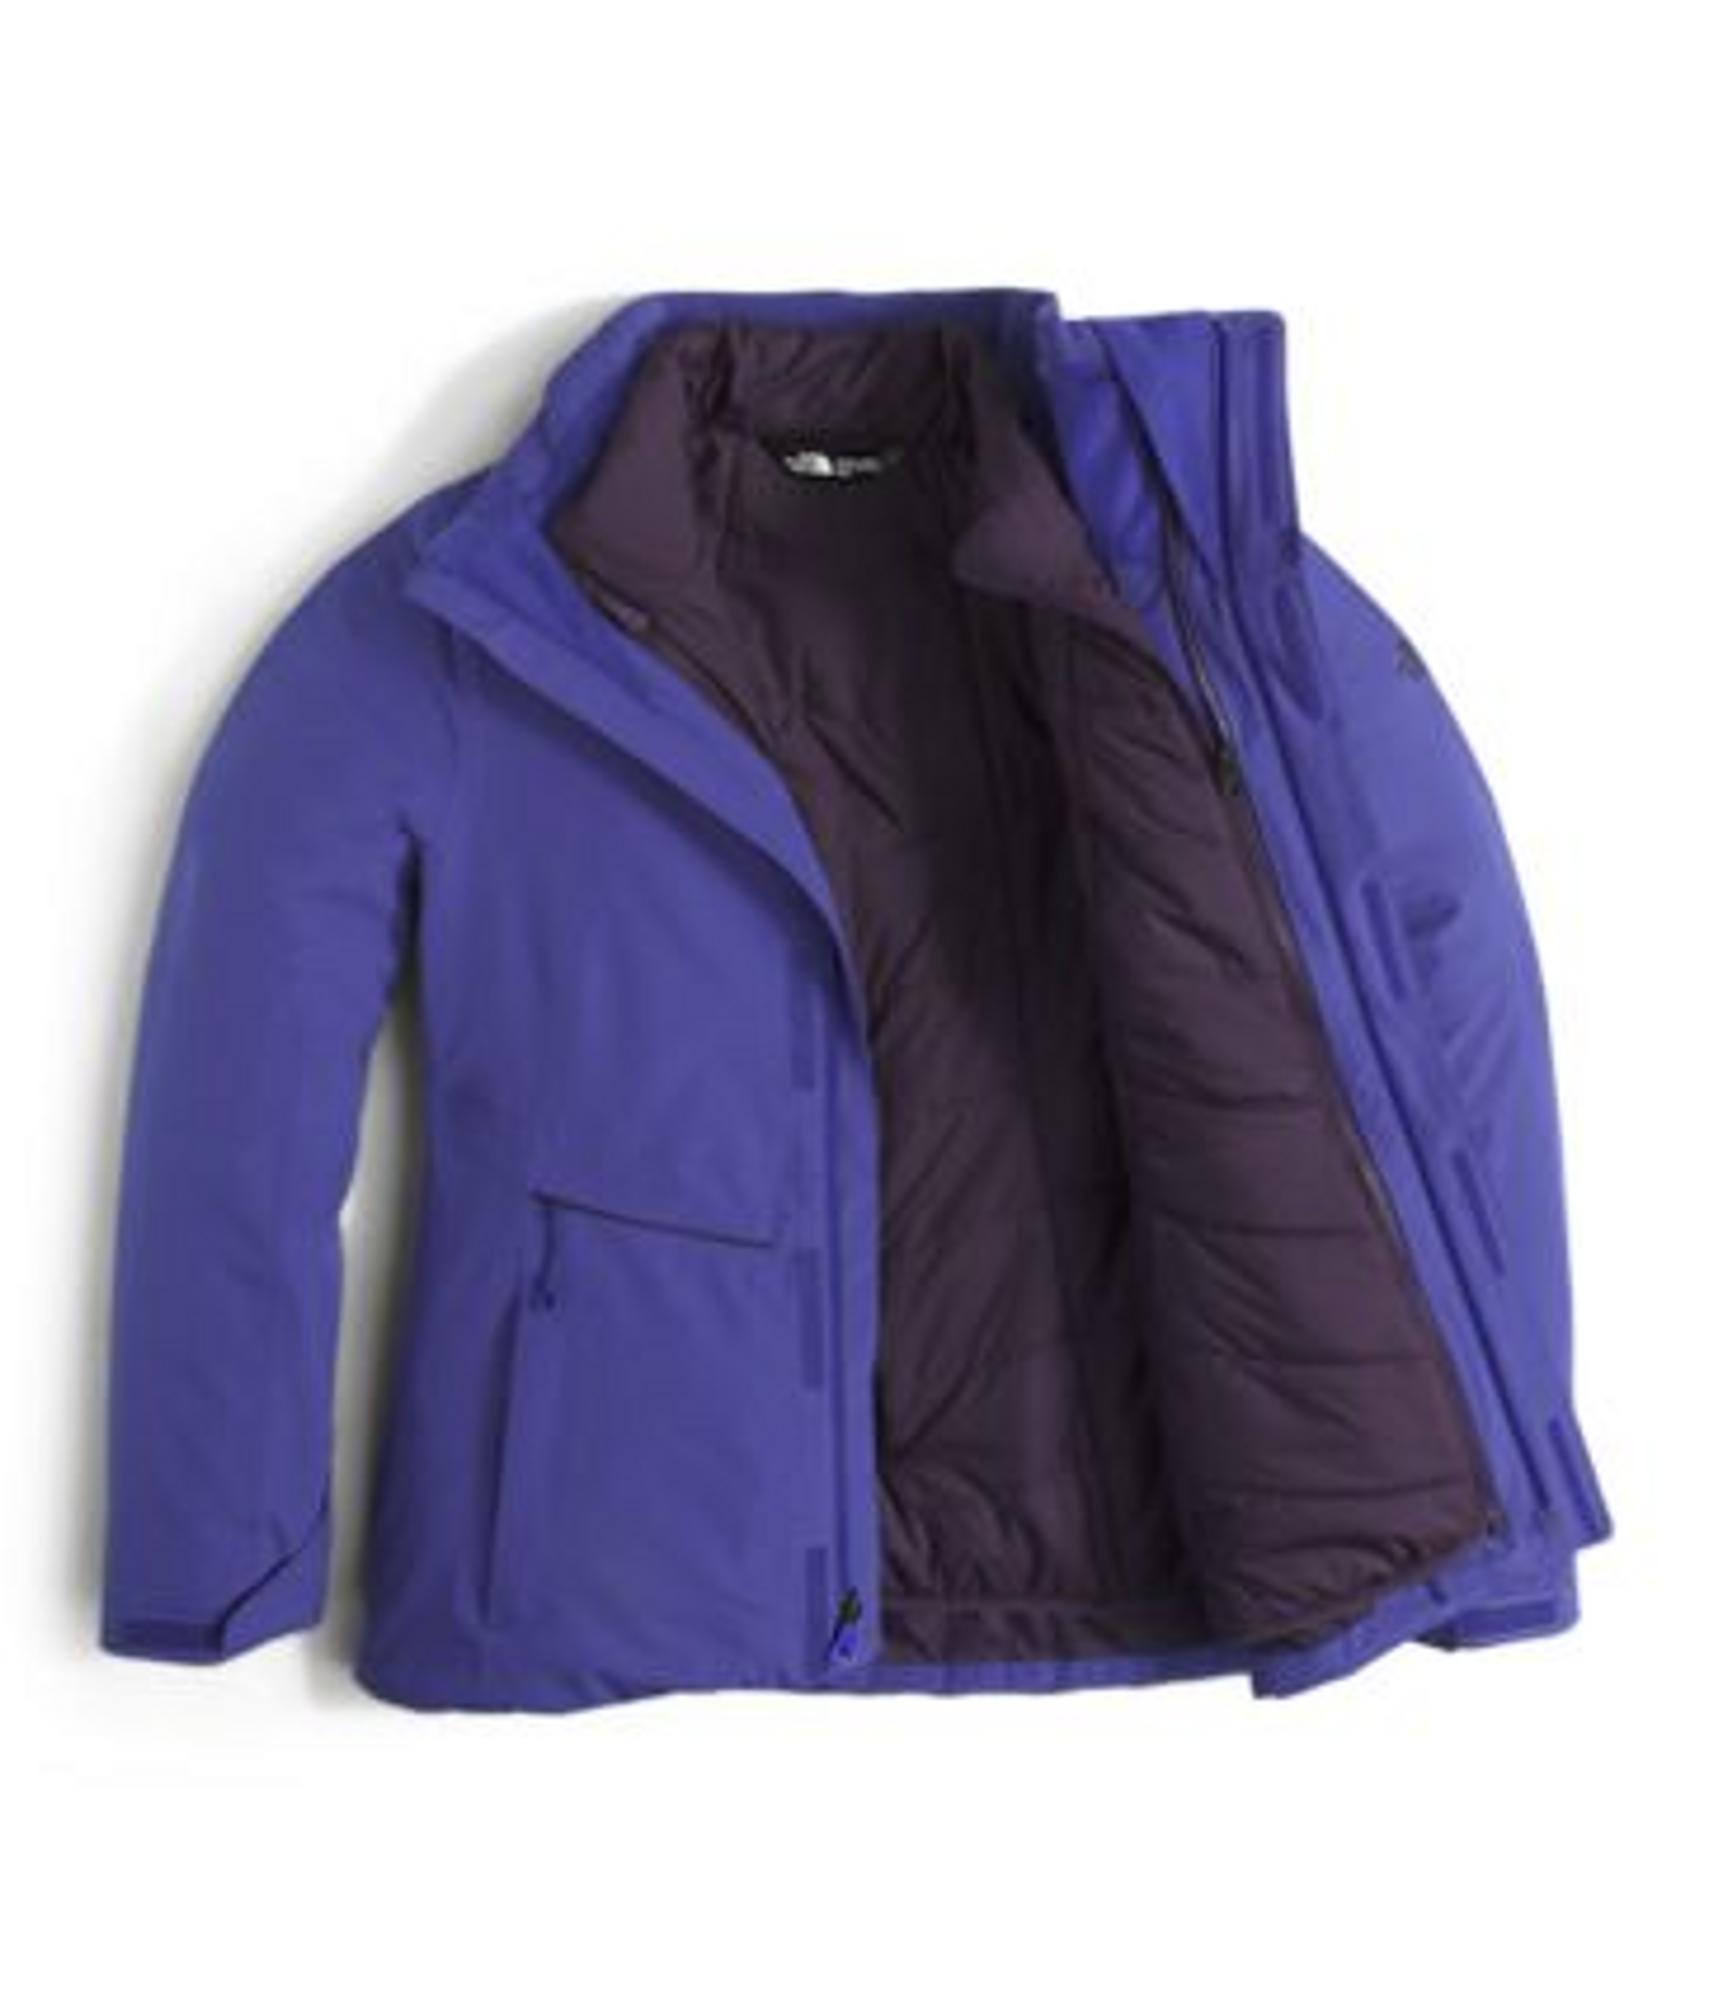 8ca931571 Women's Garner Triclimate® Jacket Transantarctic Blue Snowfl